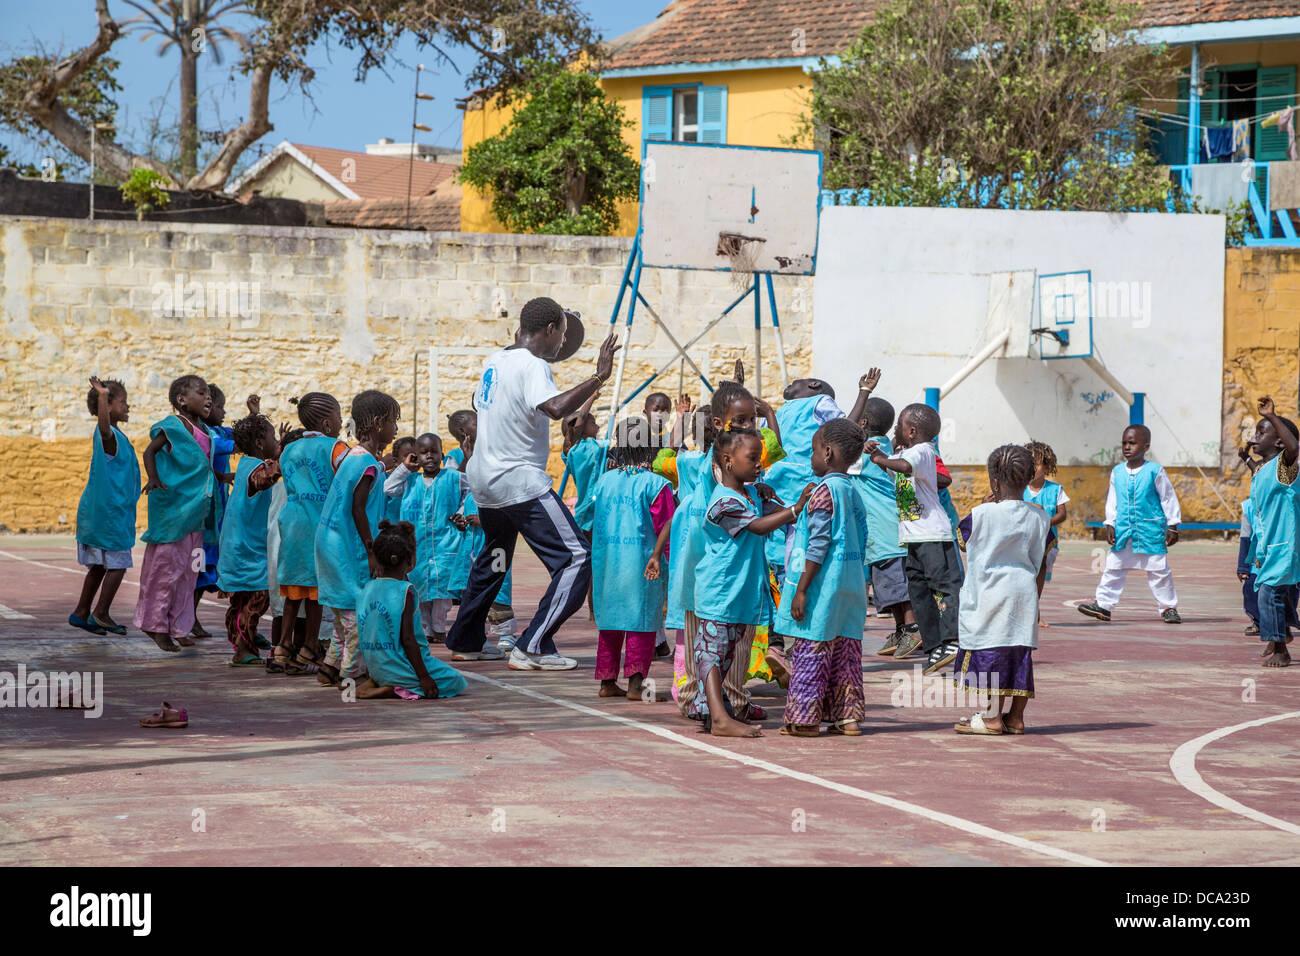 Elementary School Children Exercising in Playground, Goree Island, Senegal. - Stock Image